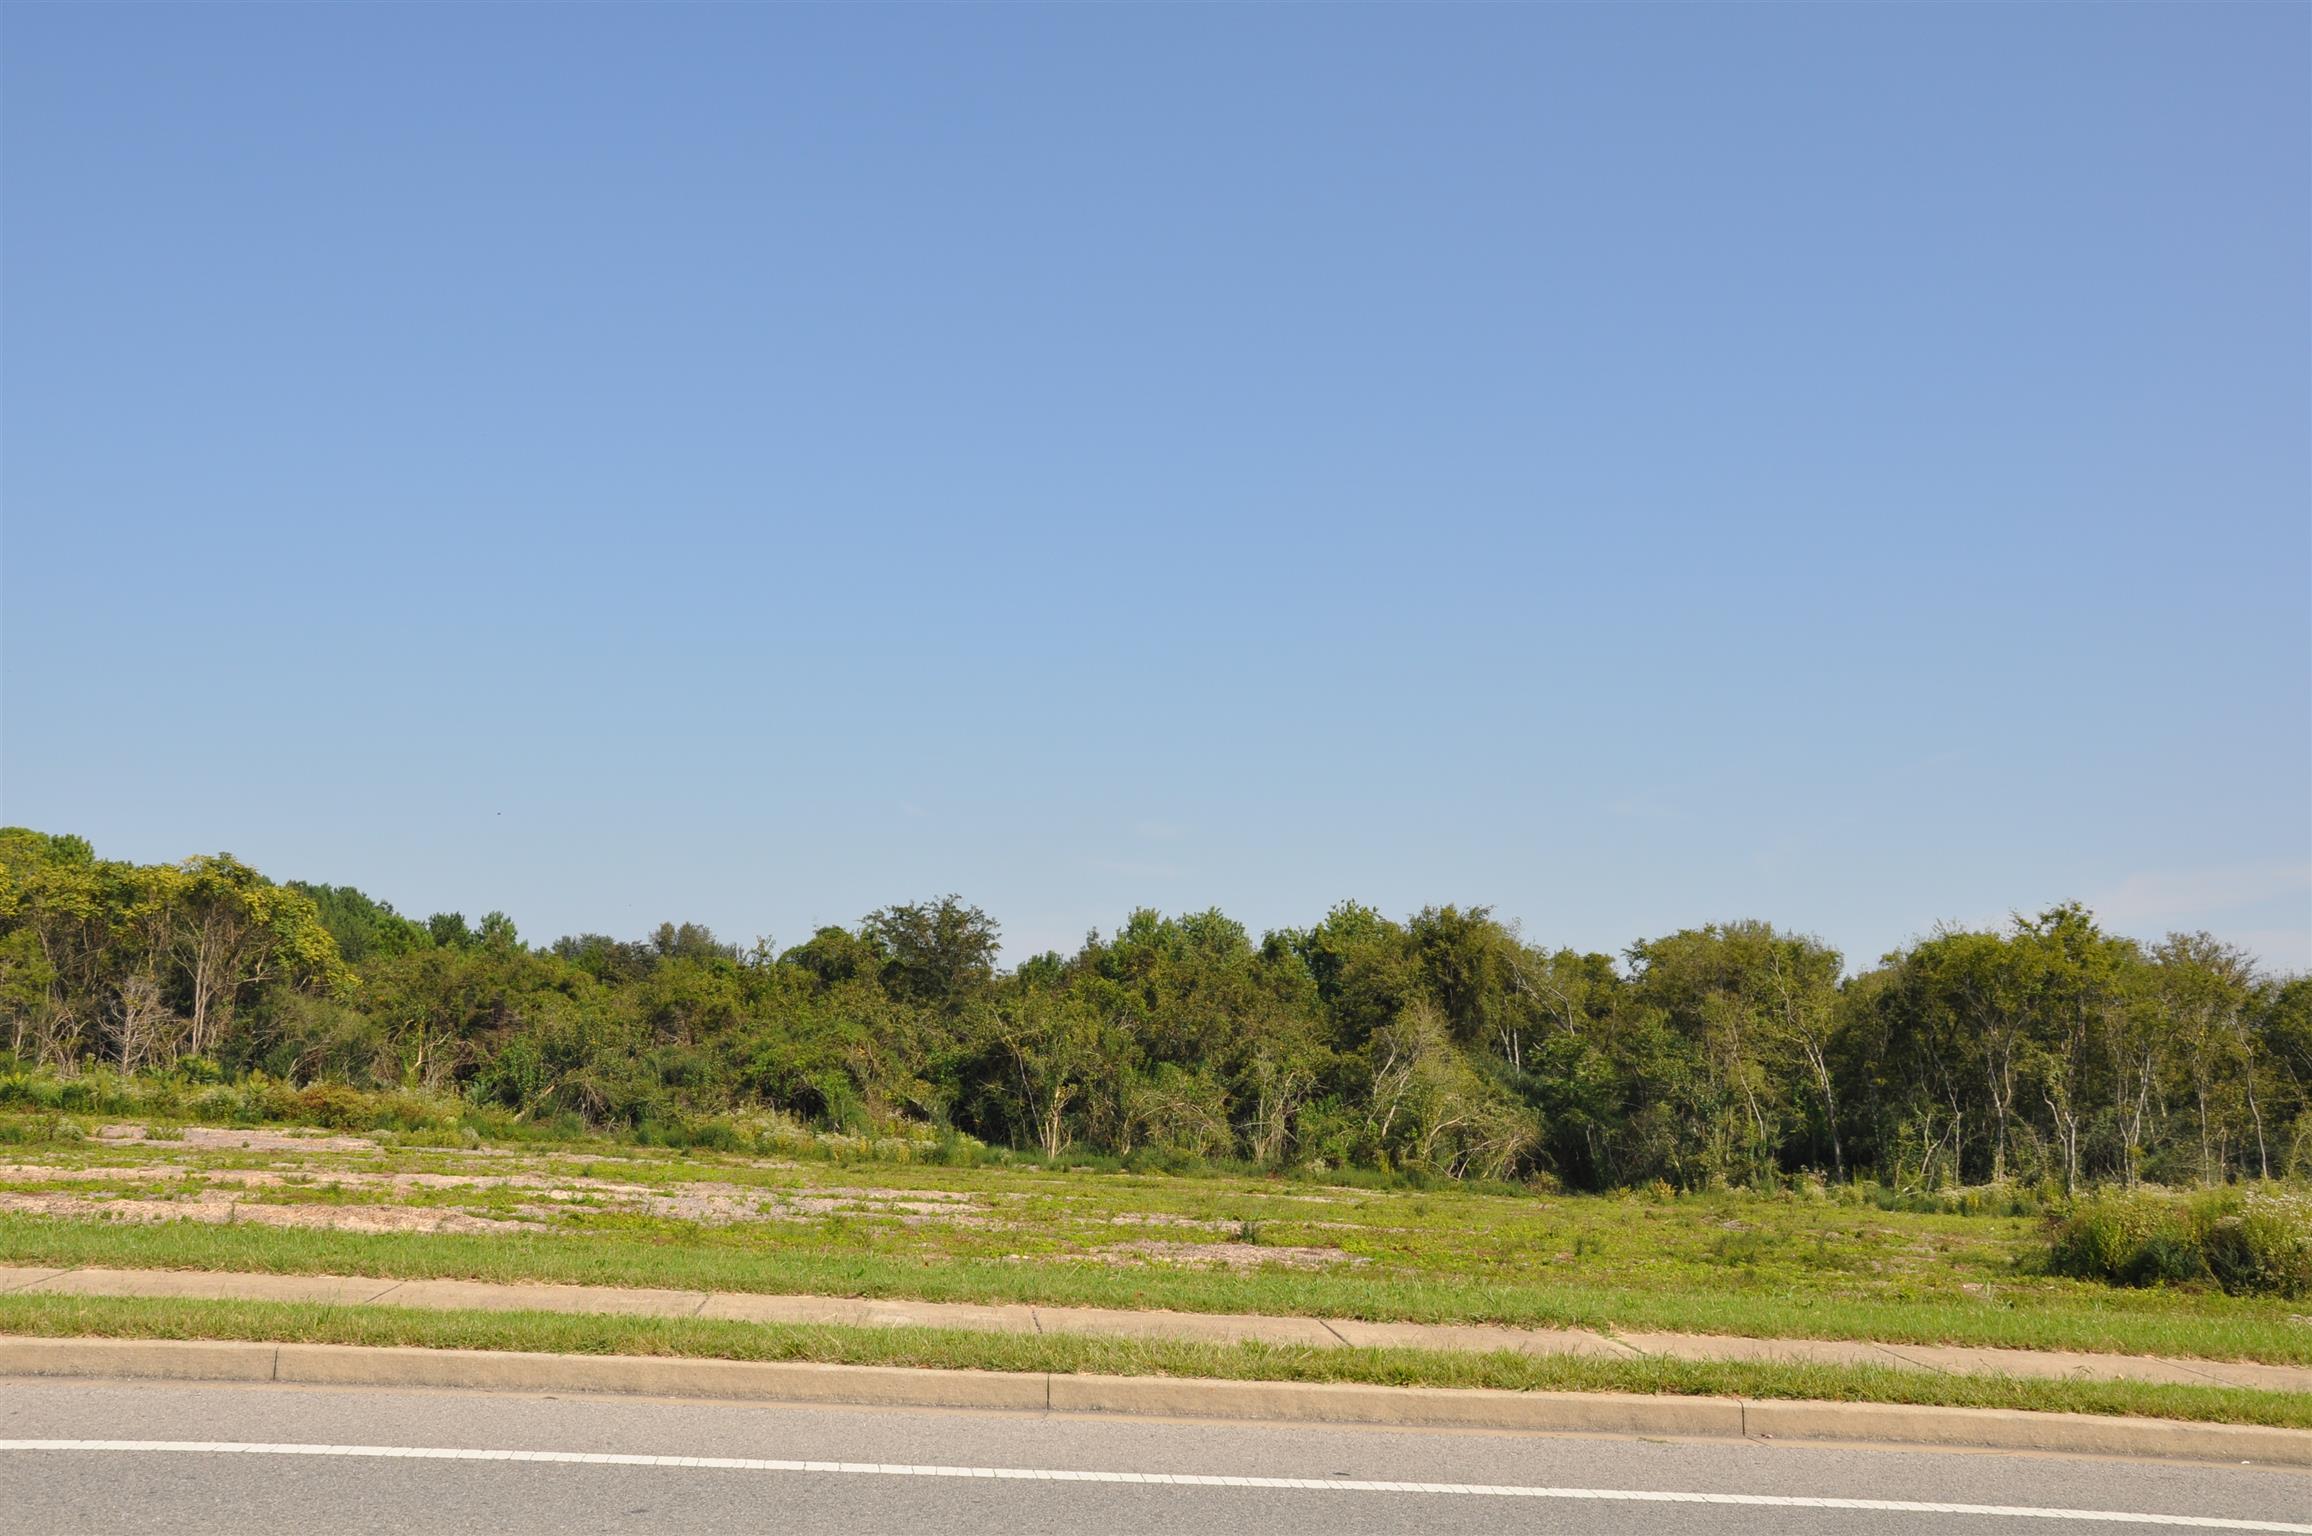 0 Dejarnette Ln, Murfreesboro, TN 37130 - Murfreesboro, TN real estate listing